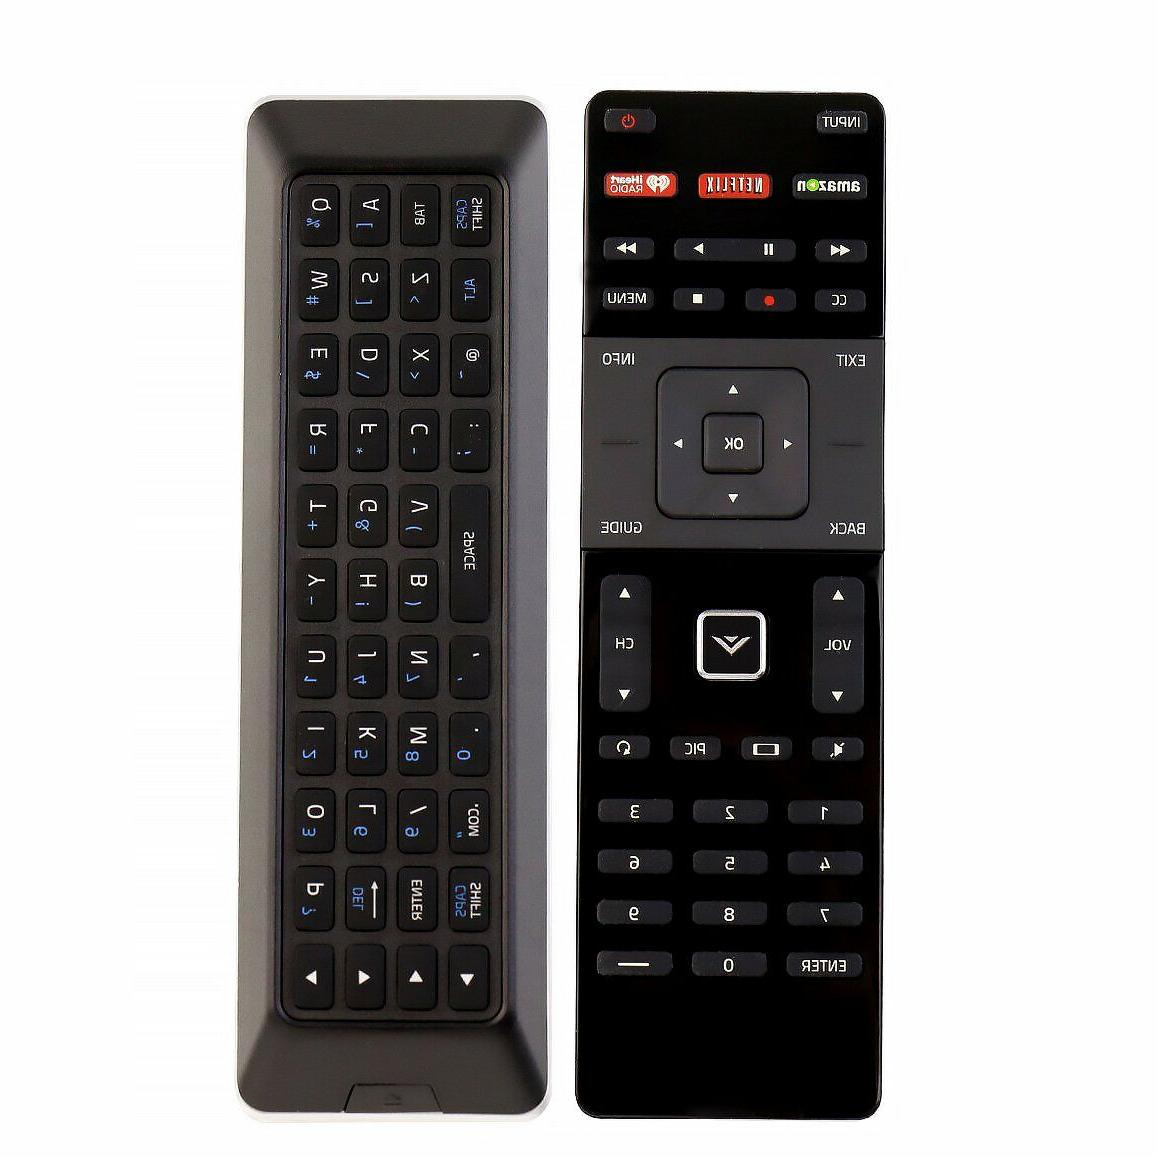 New Origina VIZIO Smart XRT500 LED remote Control with QWERT